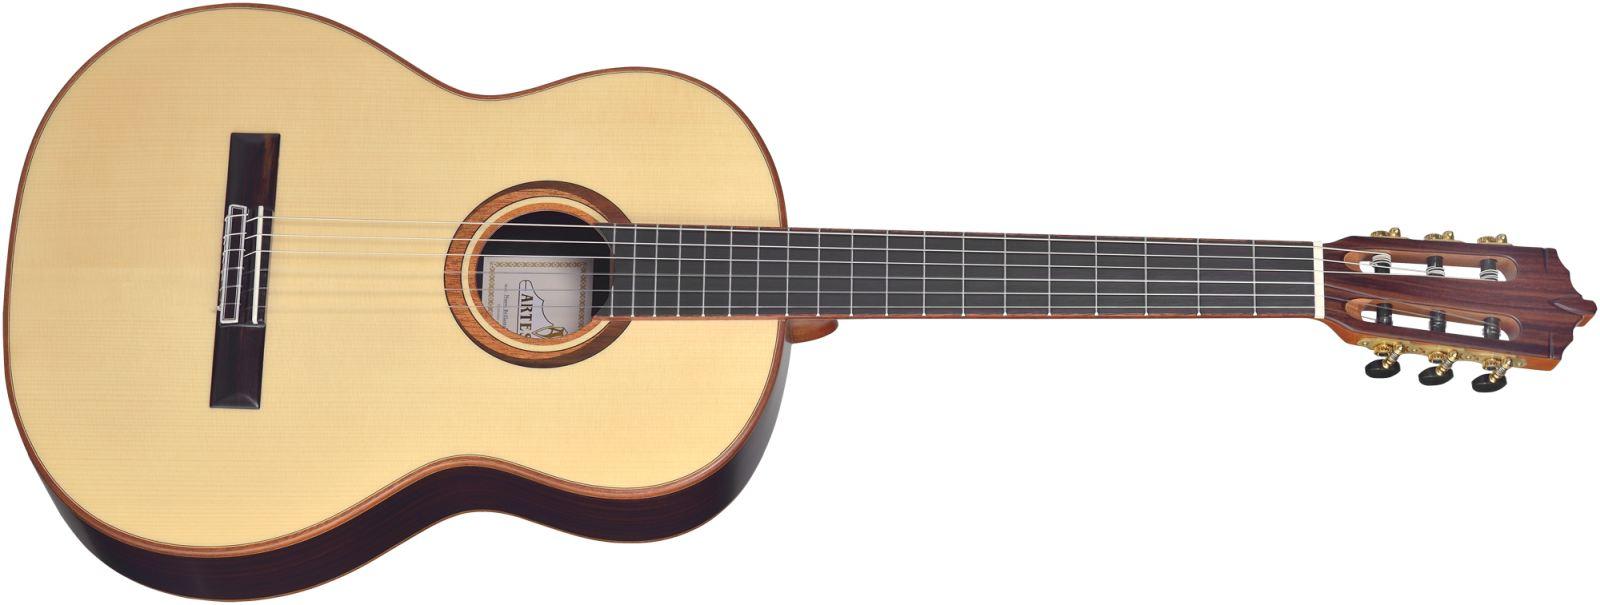 Artesano Nuevo Brillante Konzertgitarre